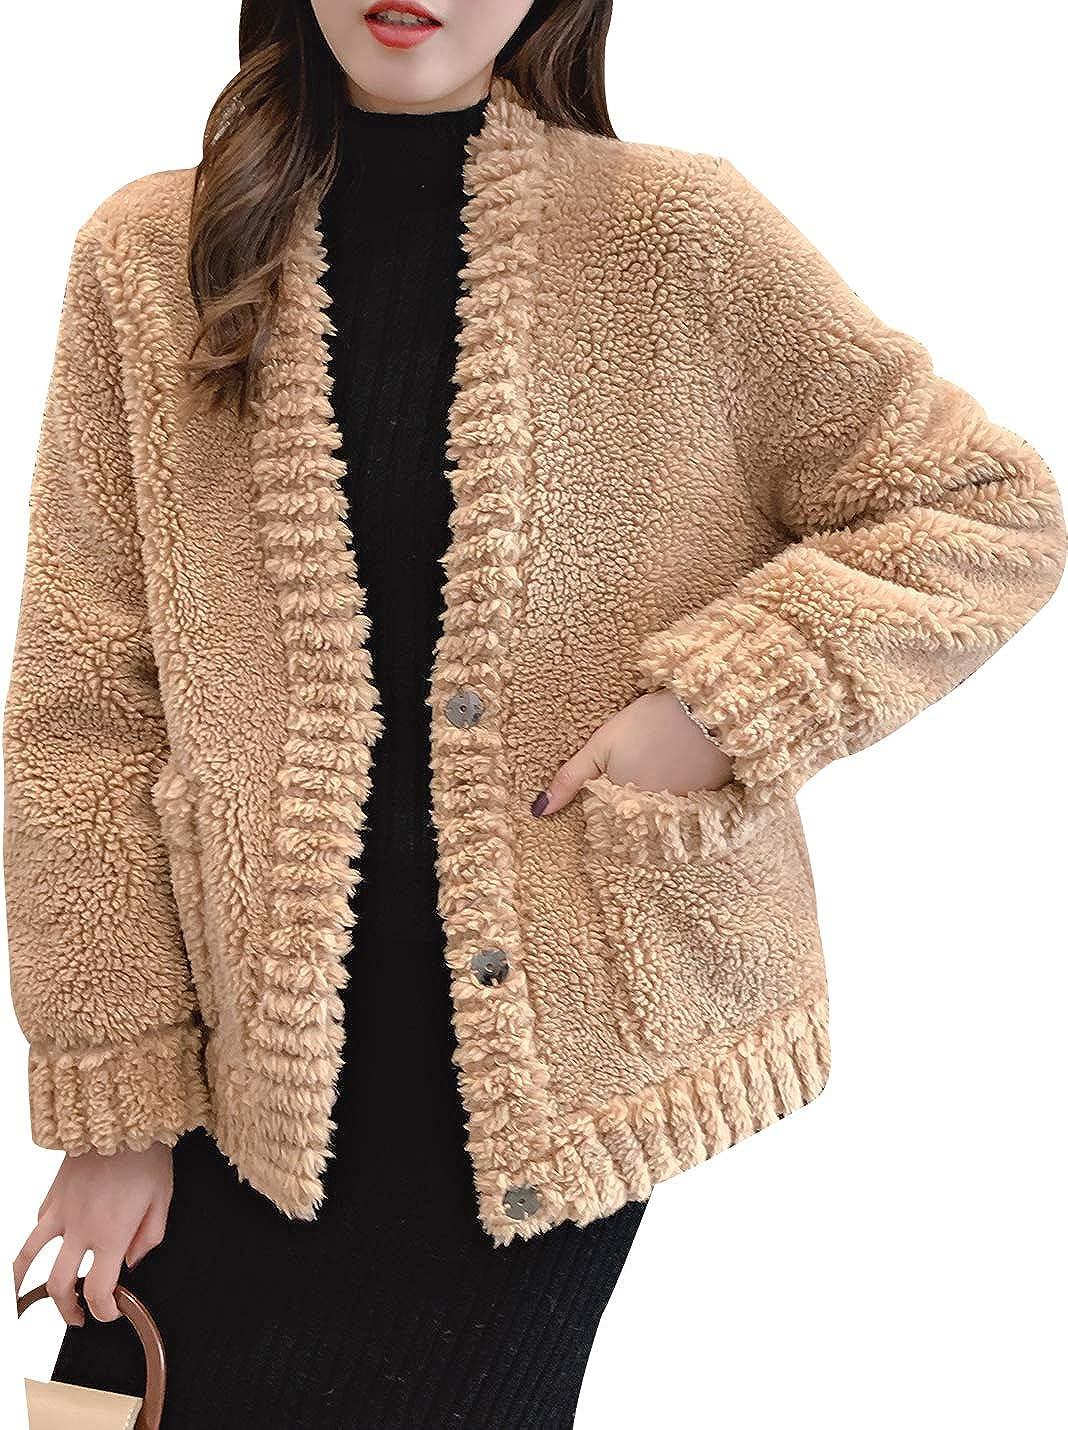 Yimoon Women's Winter Warm Fluffy Faux Fur Jacket Coat with Long Sleeve